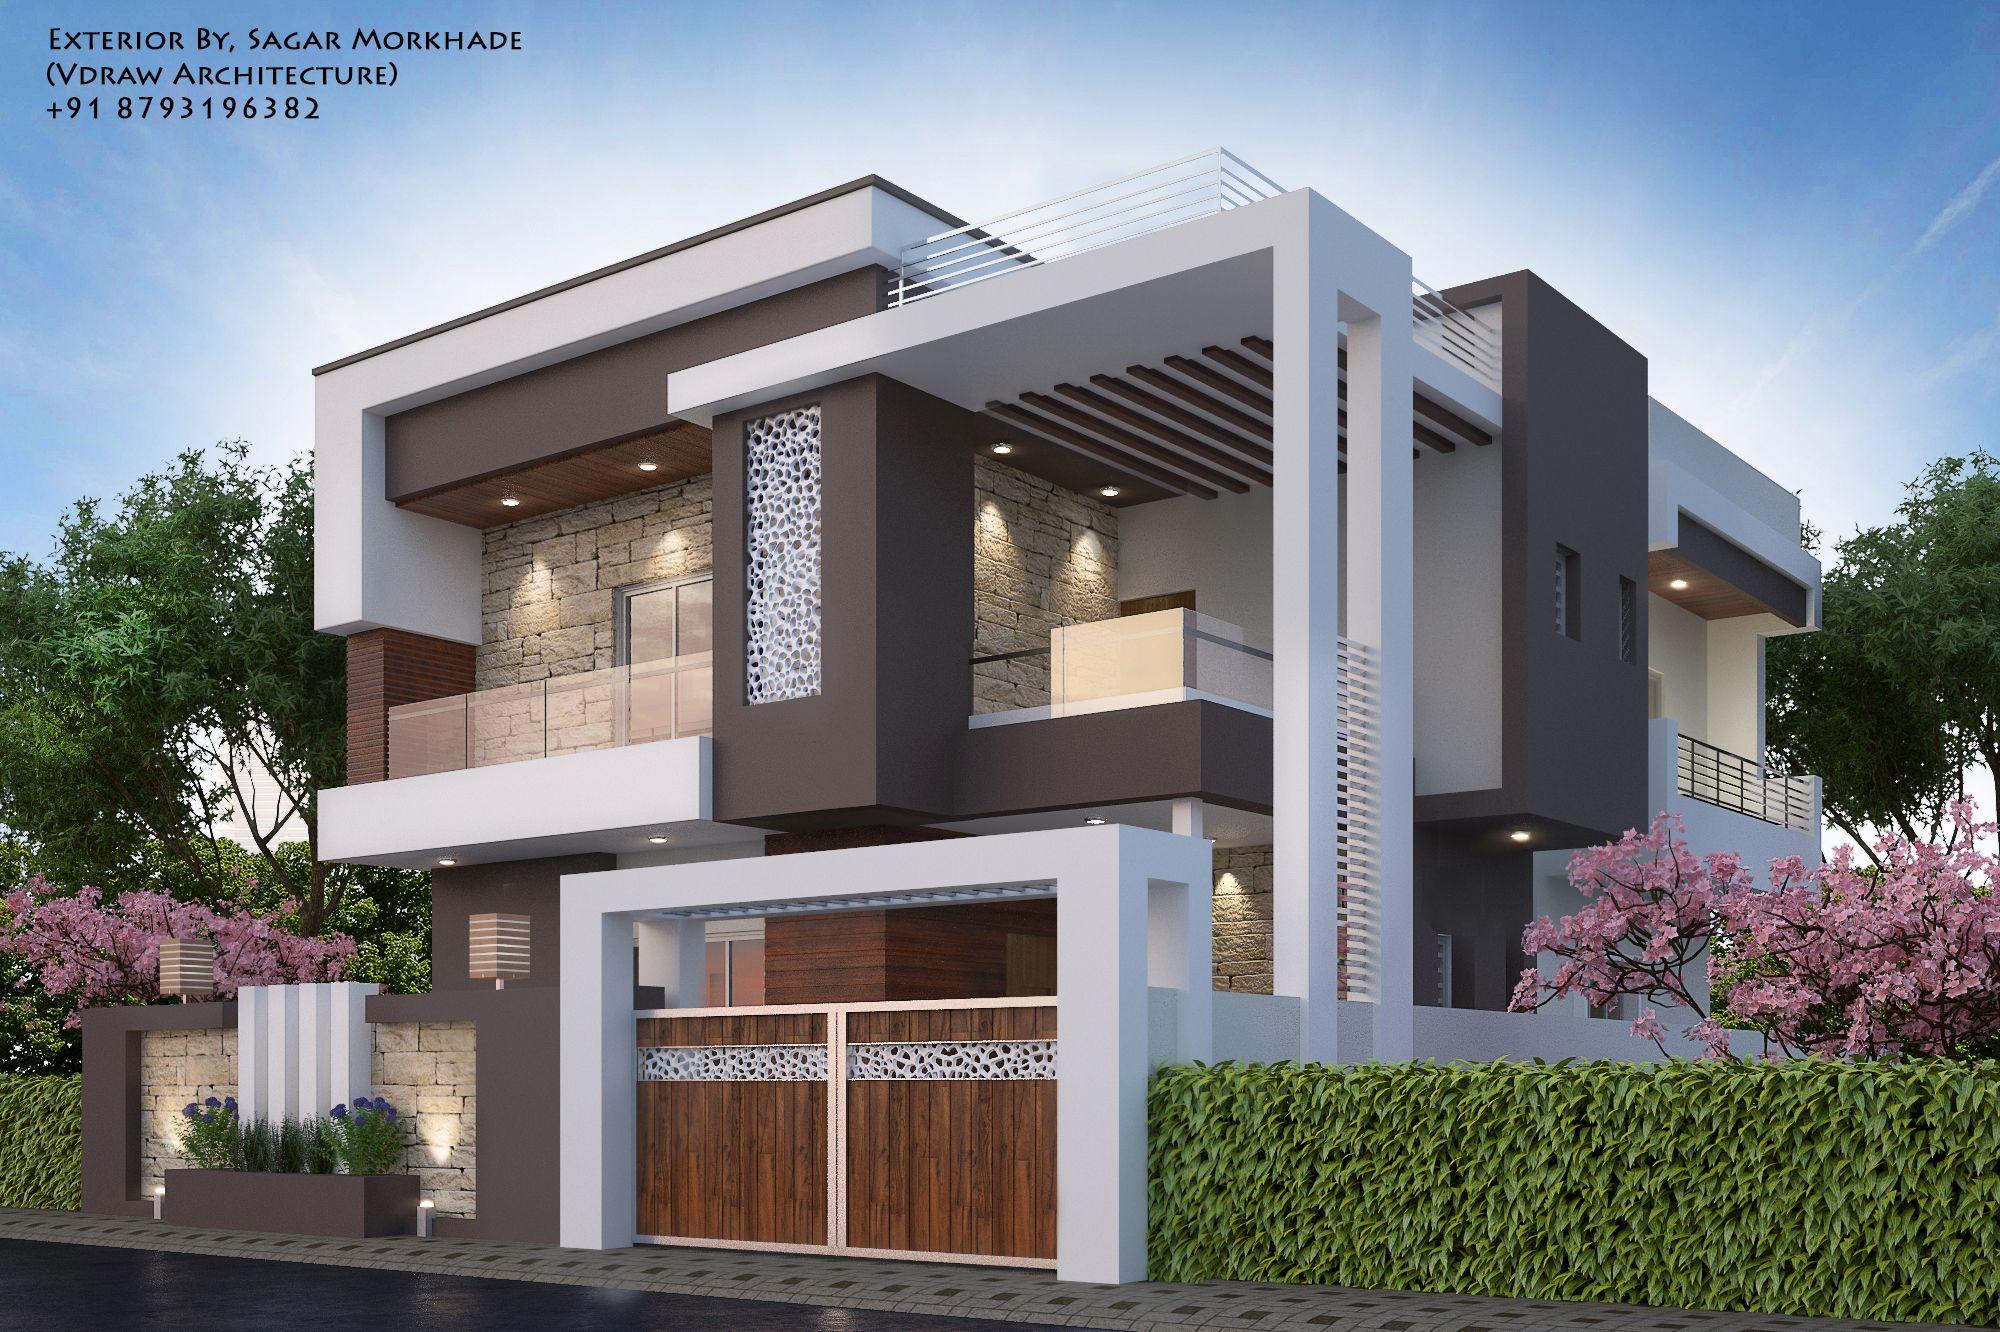 Modern House Exterior By Sagar Morkhade Vdraw